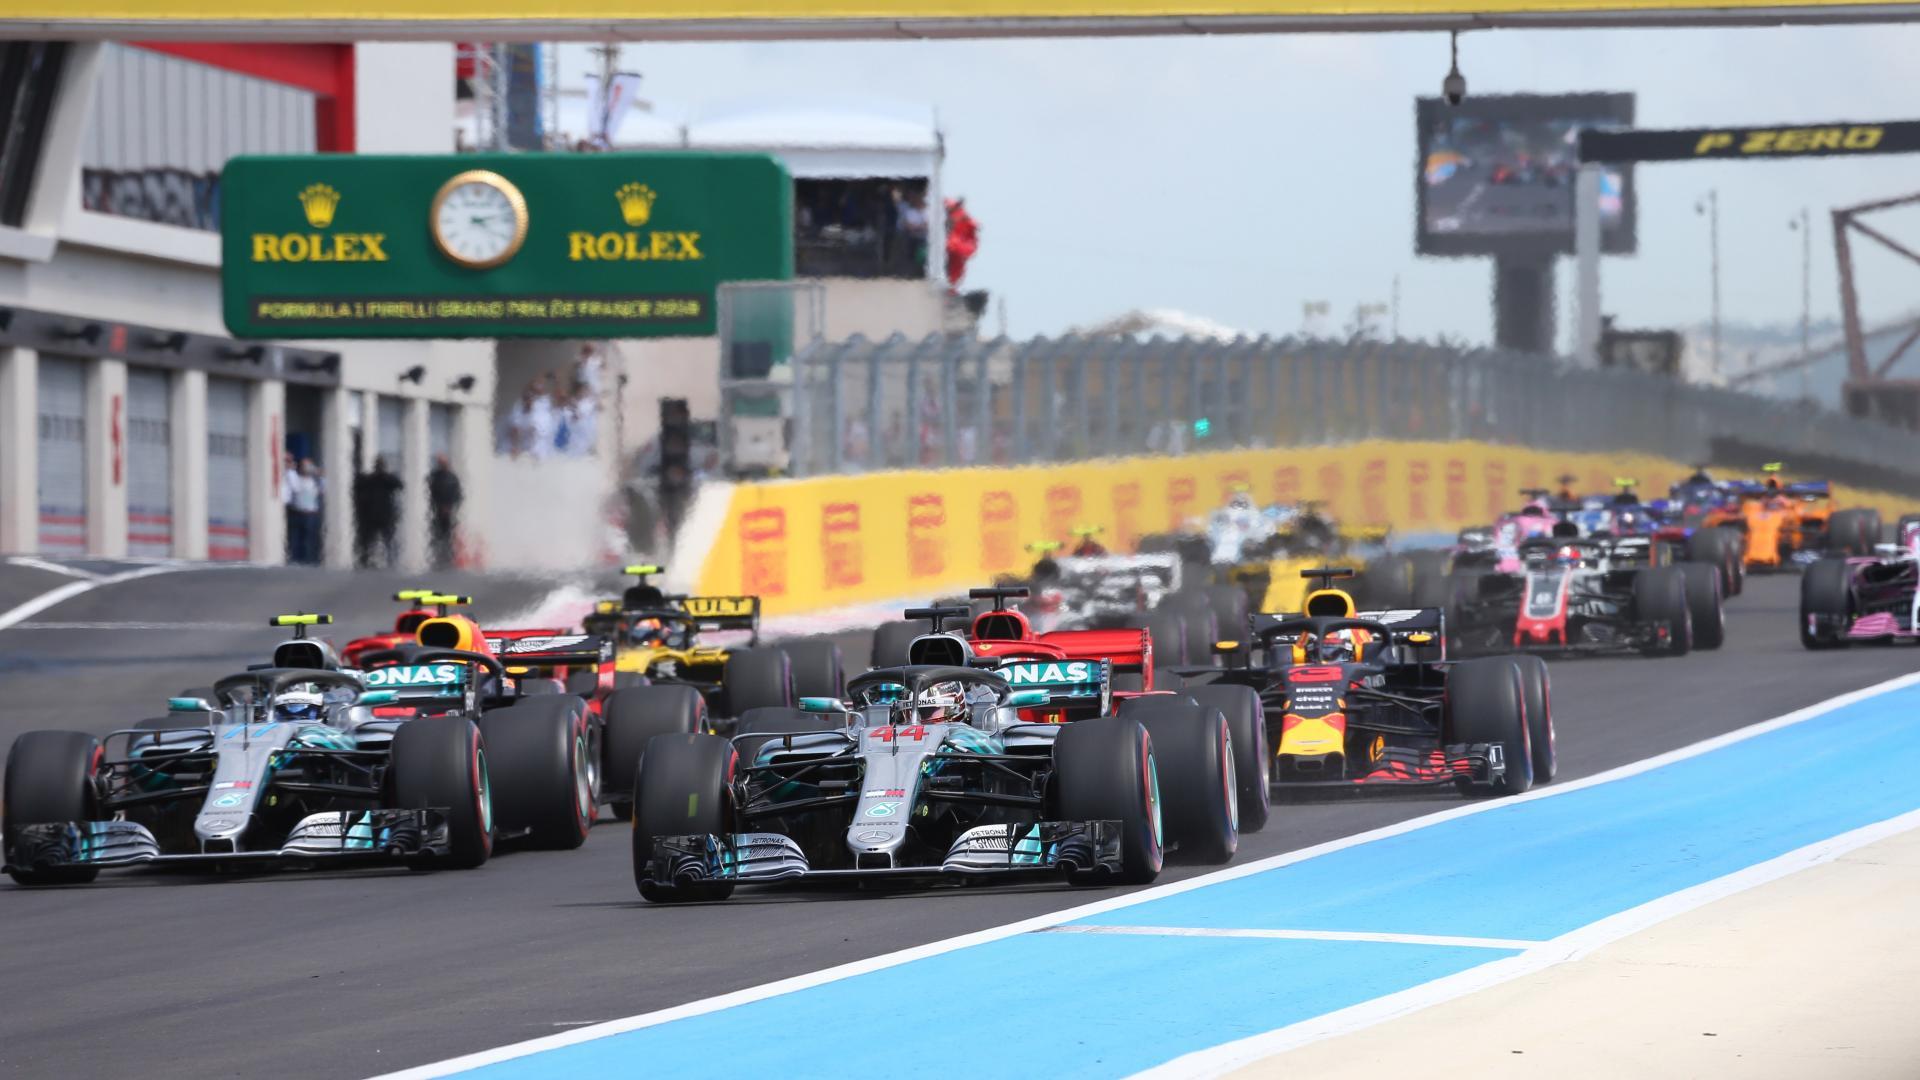 GP di Formula 1 di Francia 2019